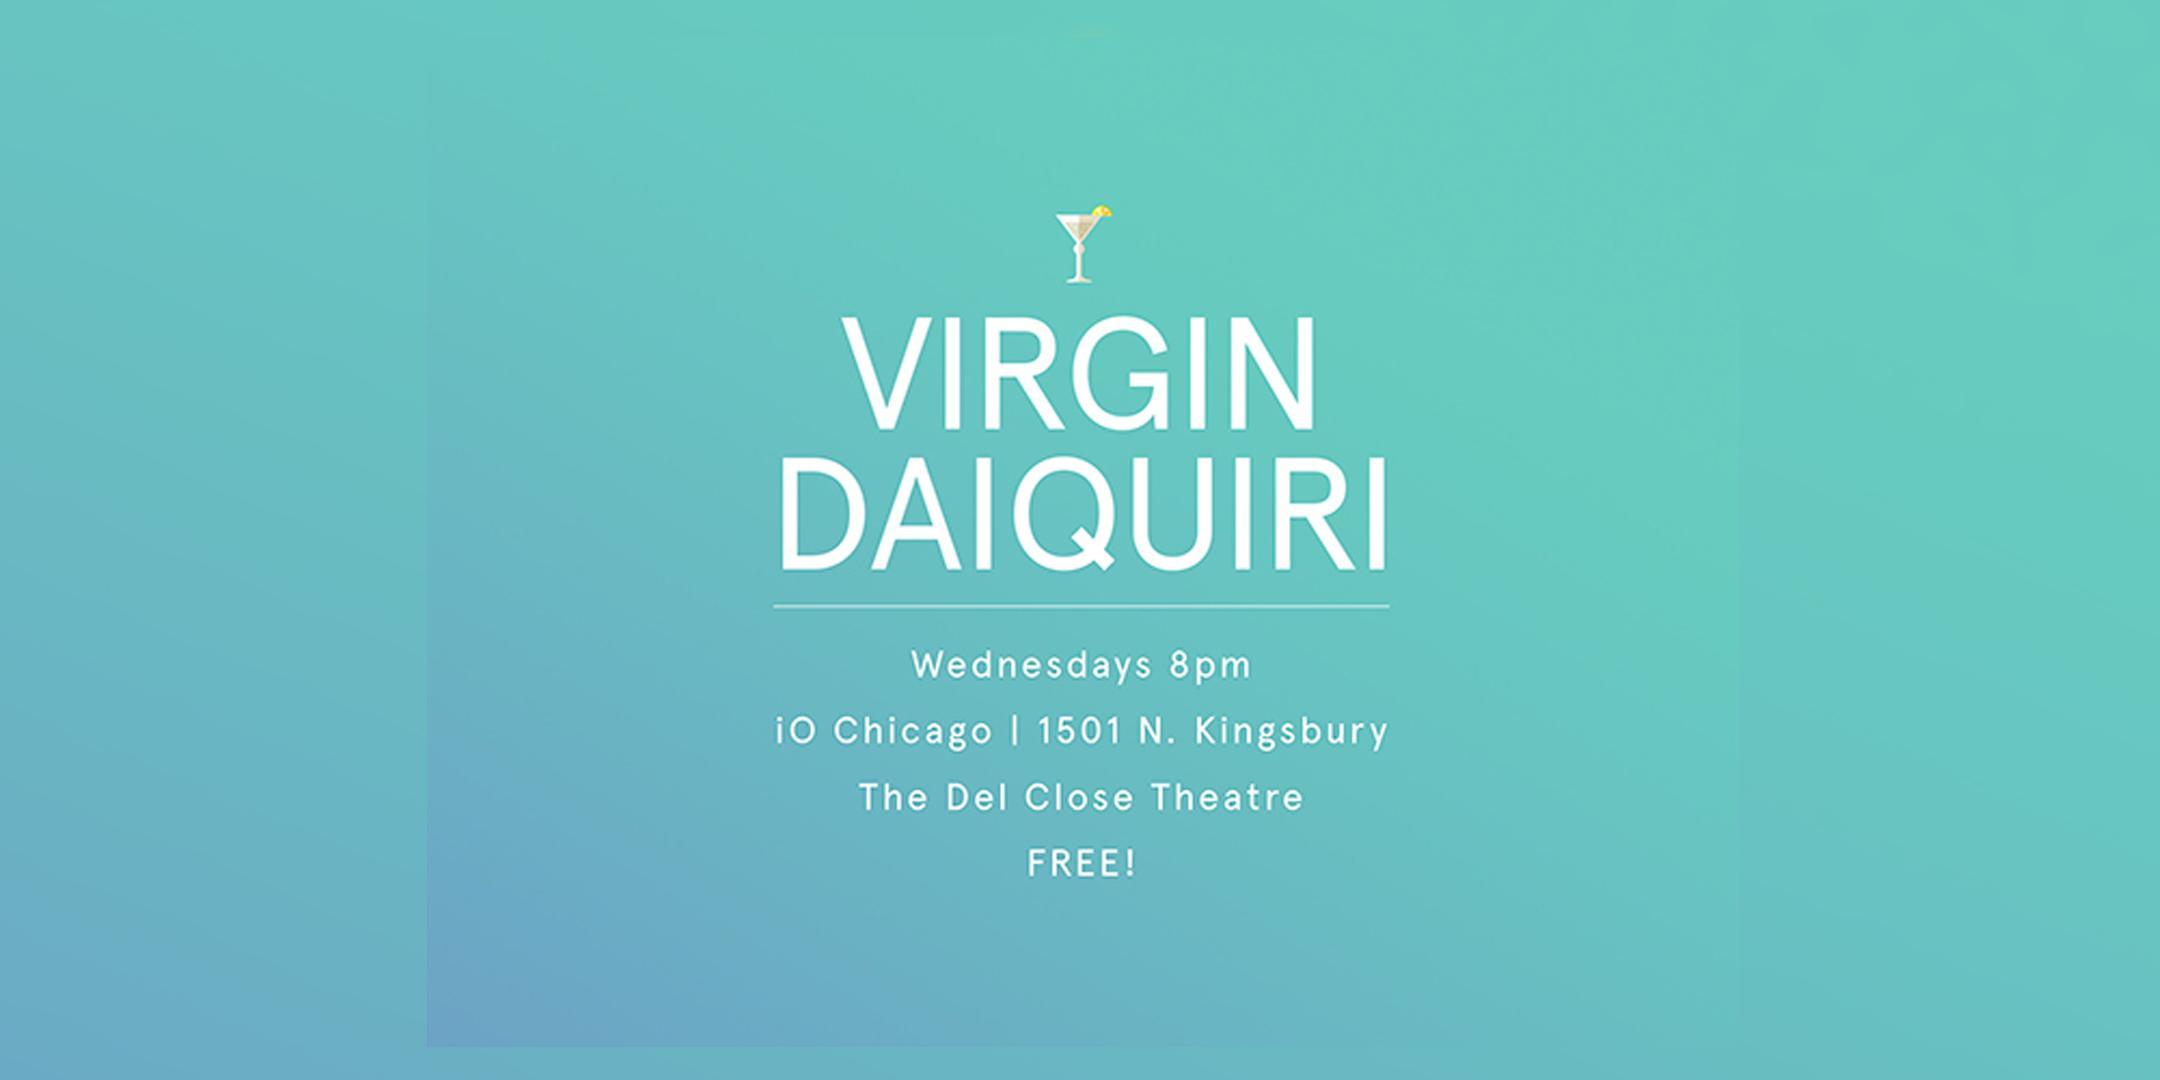 Virgin Daiquiri